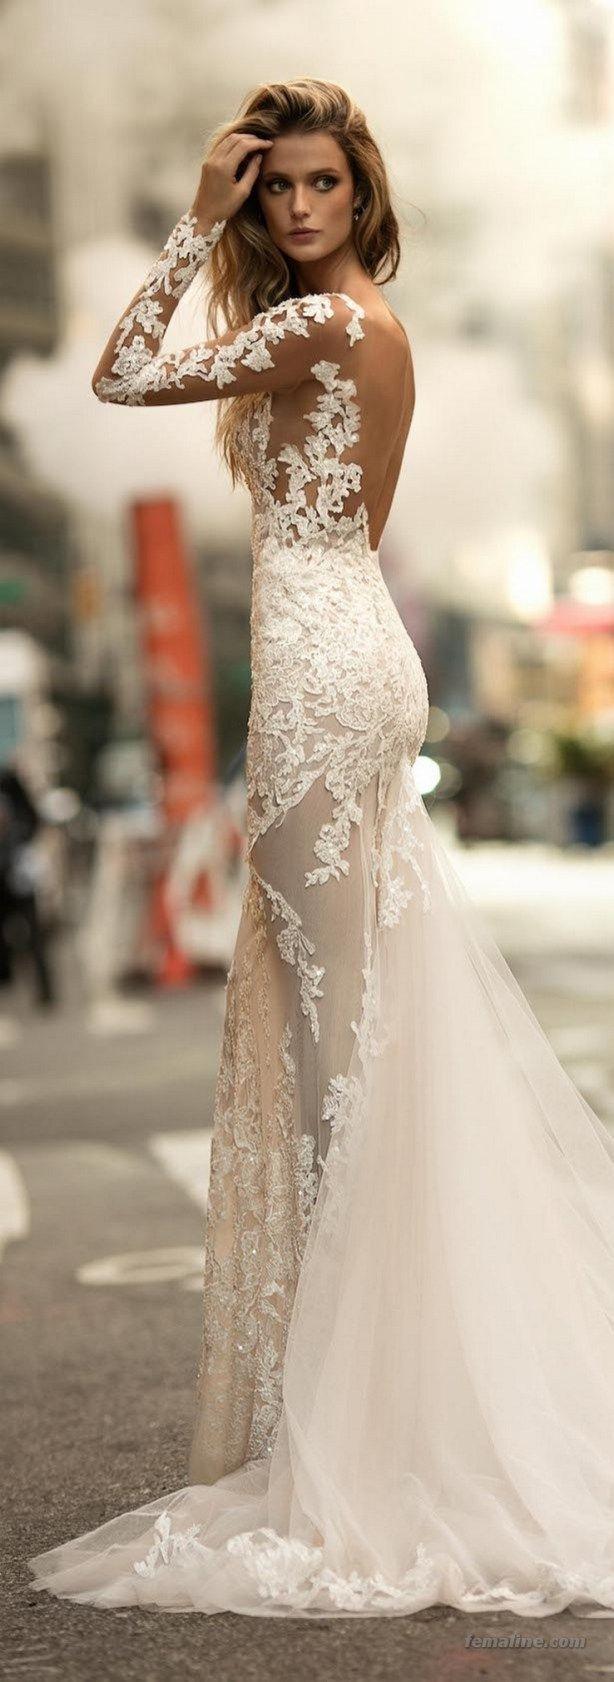 139 ideas for fall 2017 wedding dress trends (126)